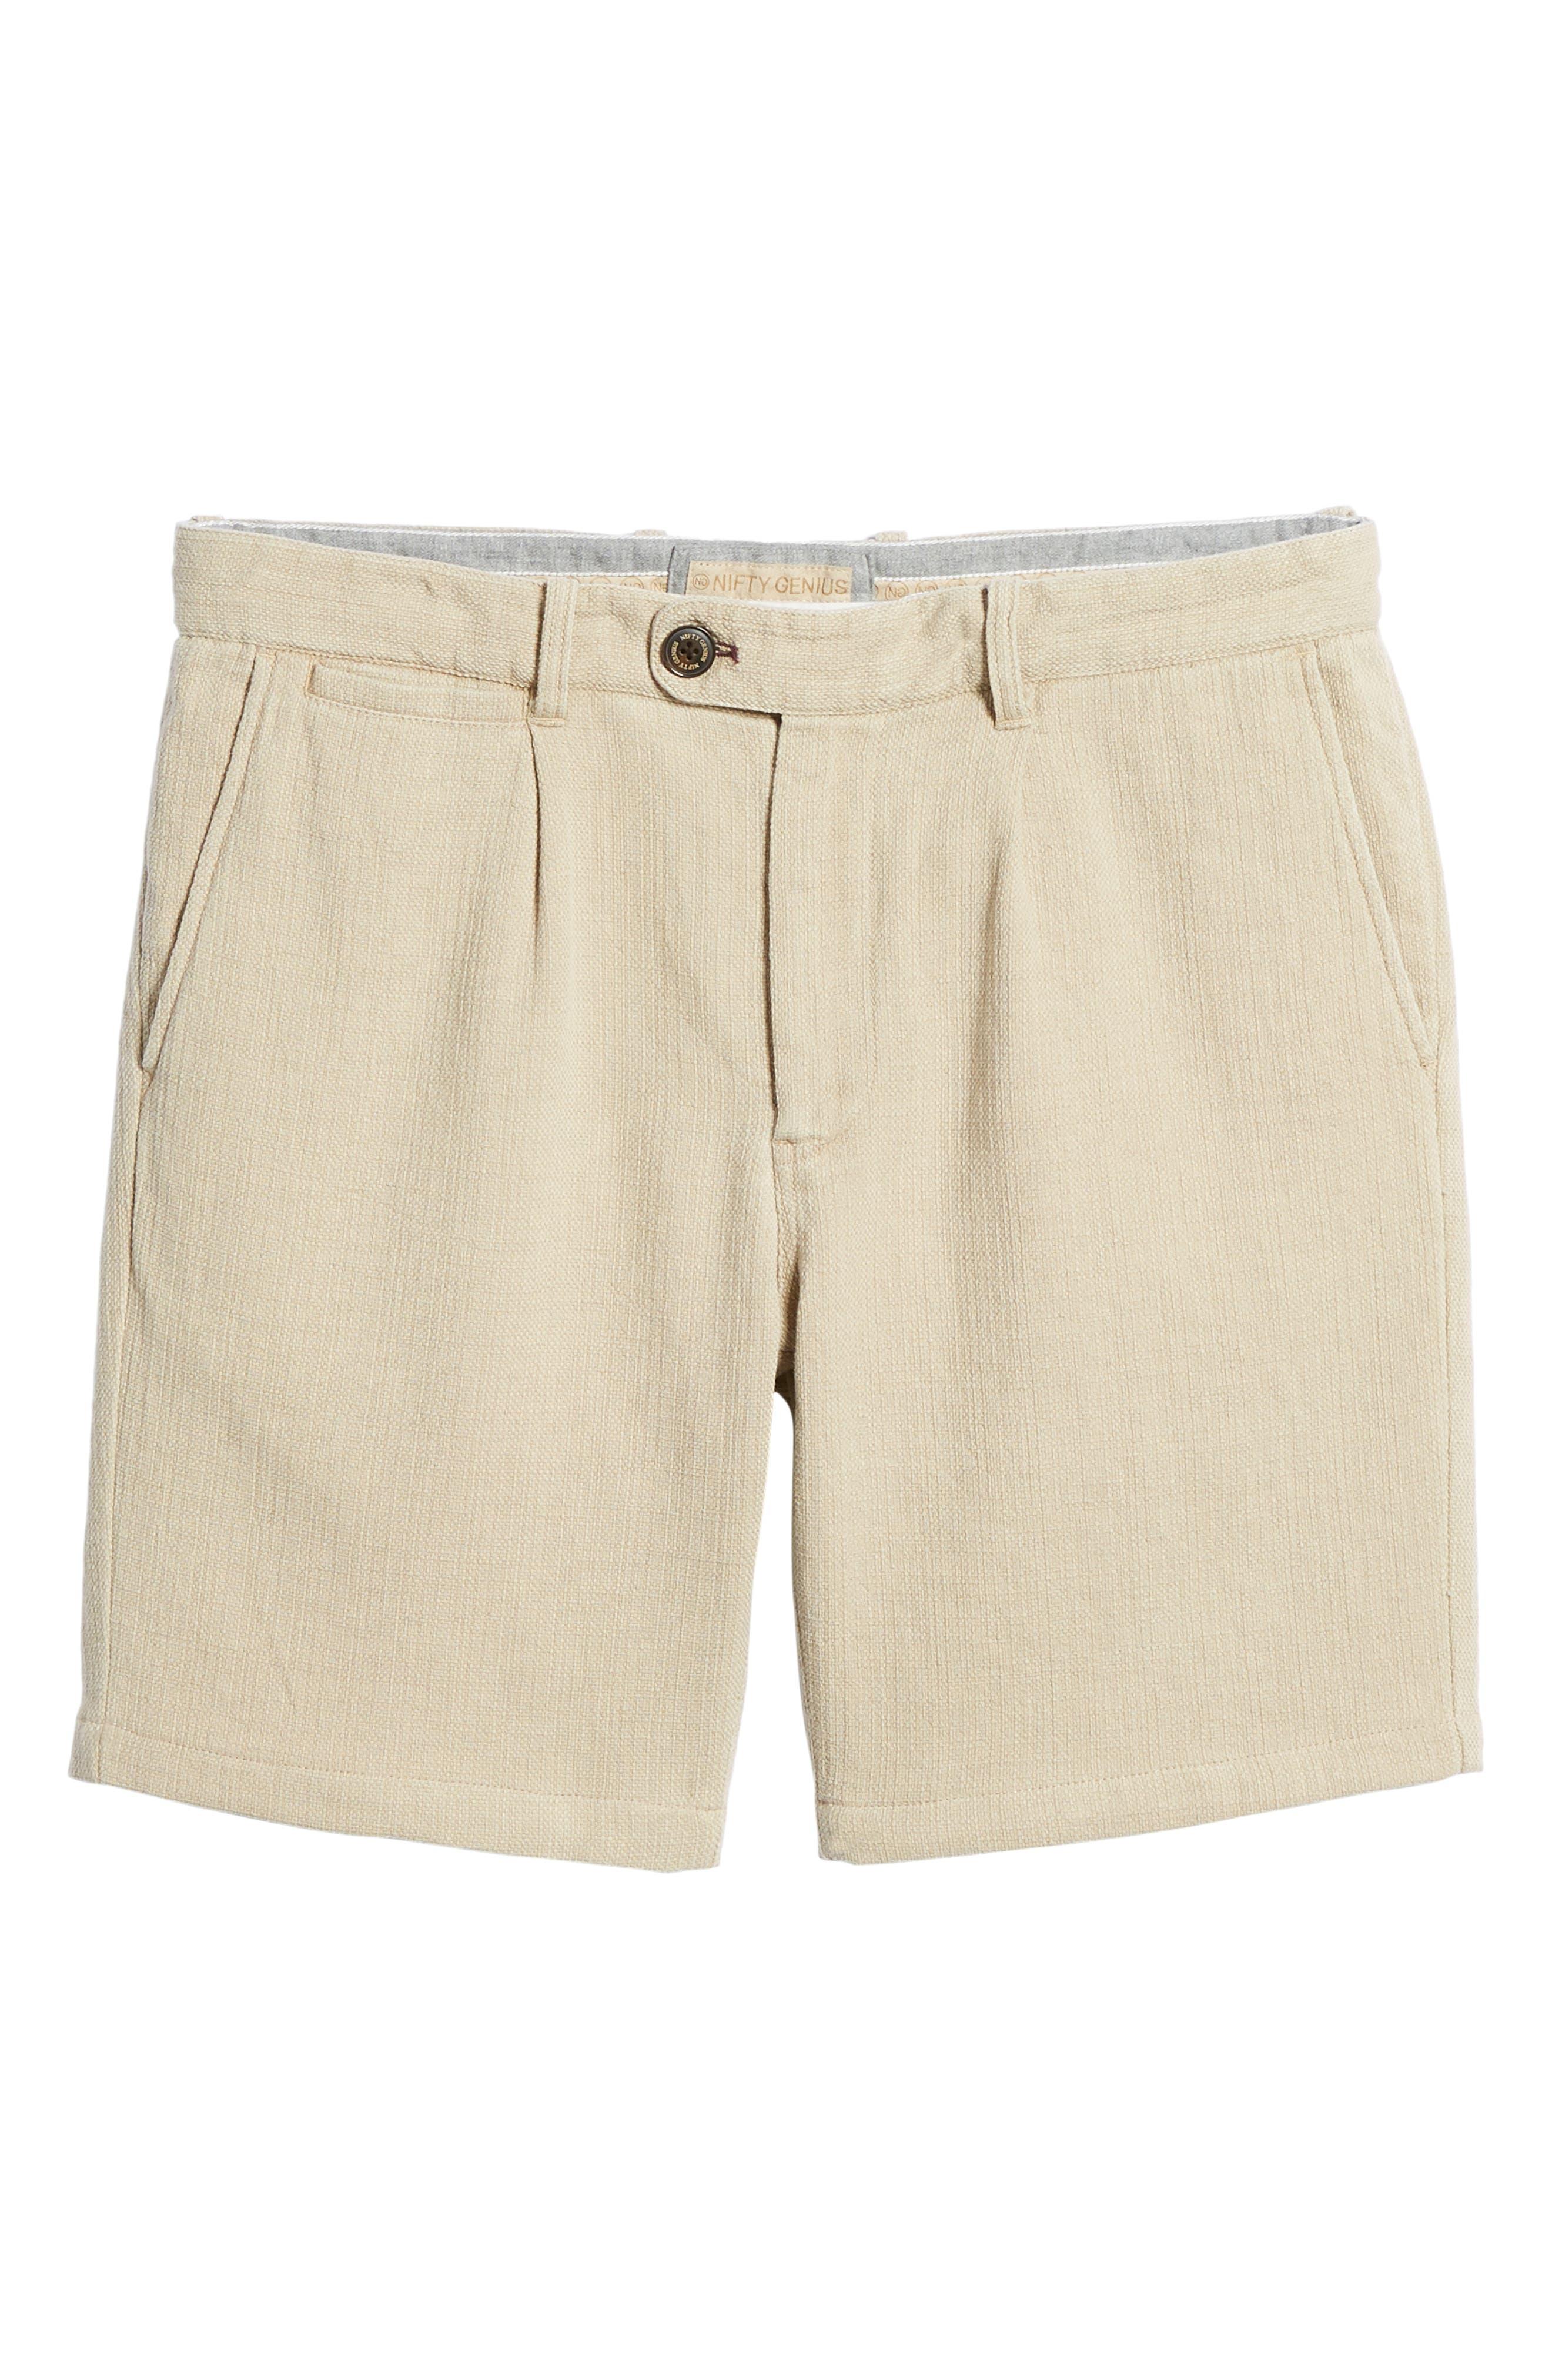 Thomas Regular Fit Pleated Shorts,                             Alternate thumbnail 6, color,                             Tan